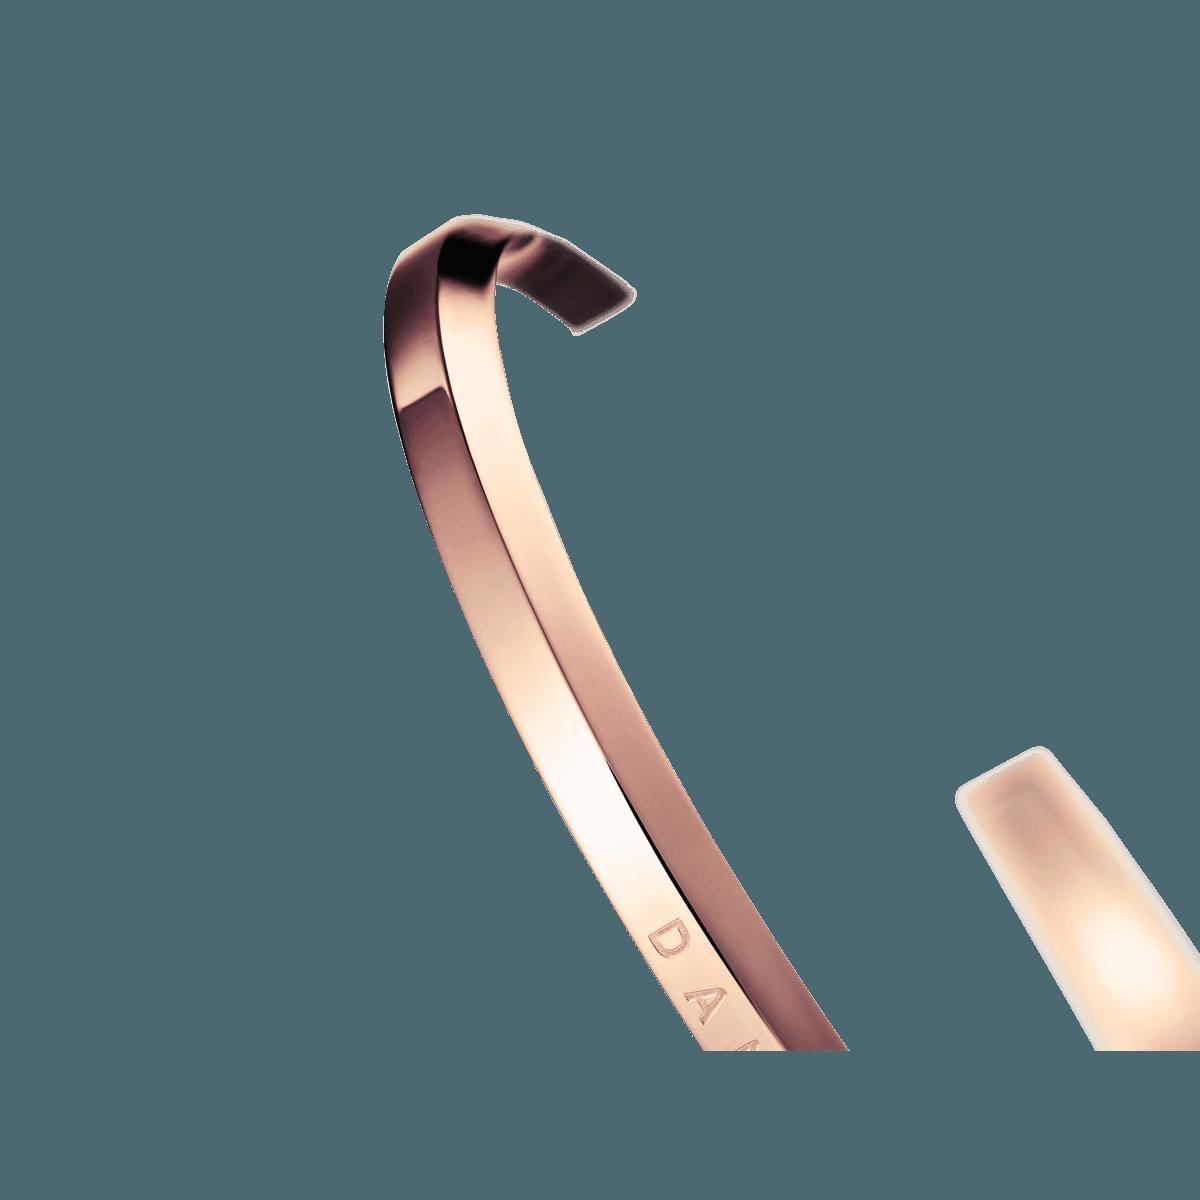 dw官网 dw手表官网 dw中国官网 dw官方旗舰店 DW DW官网  Bundle W+B Classic Sheffield RG 36mm+Bracelet RG L